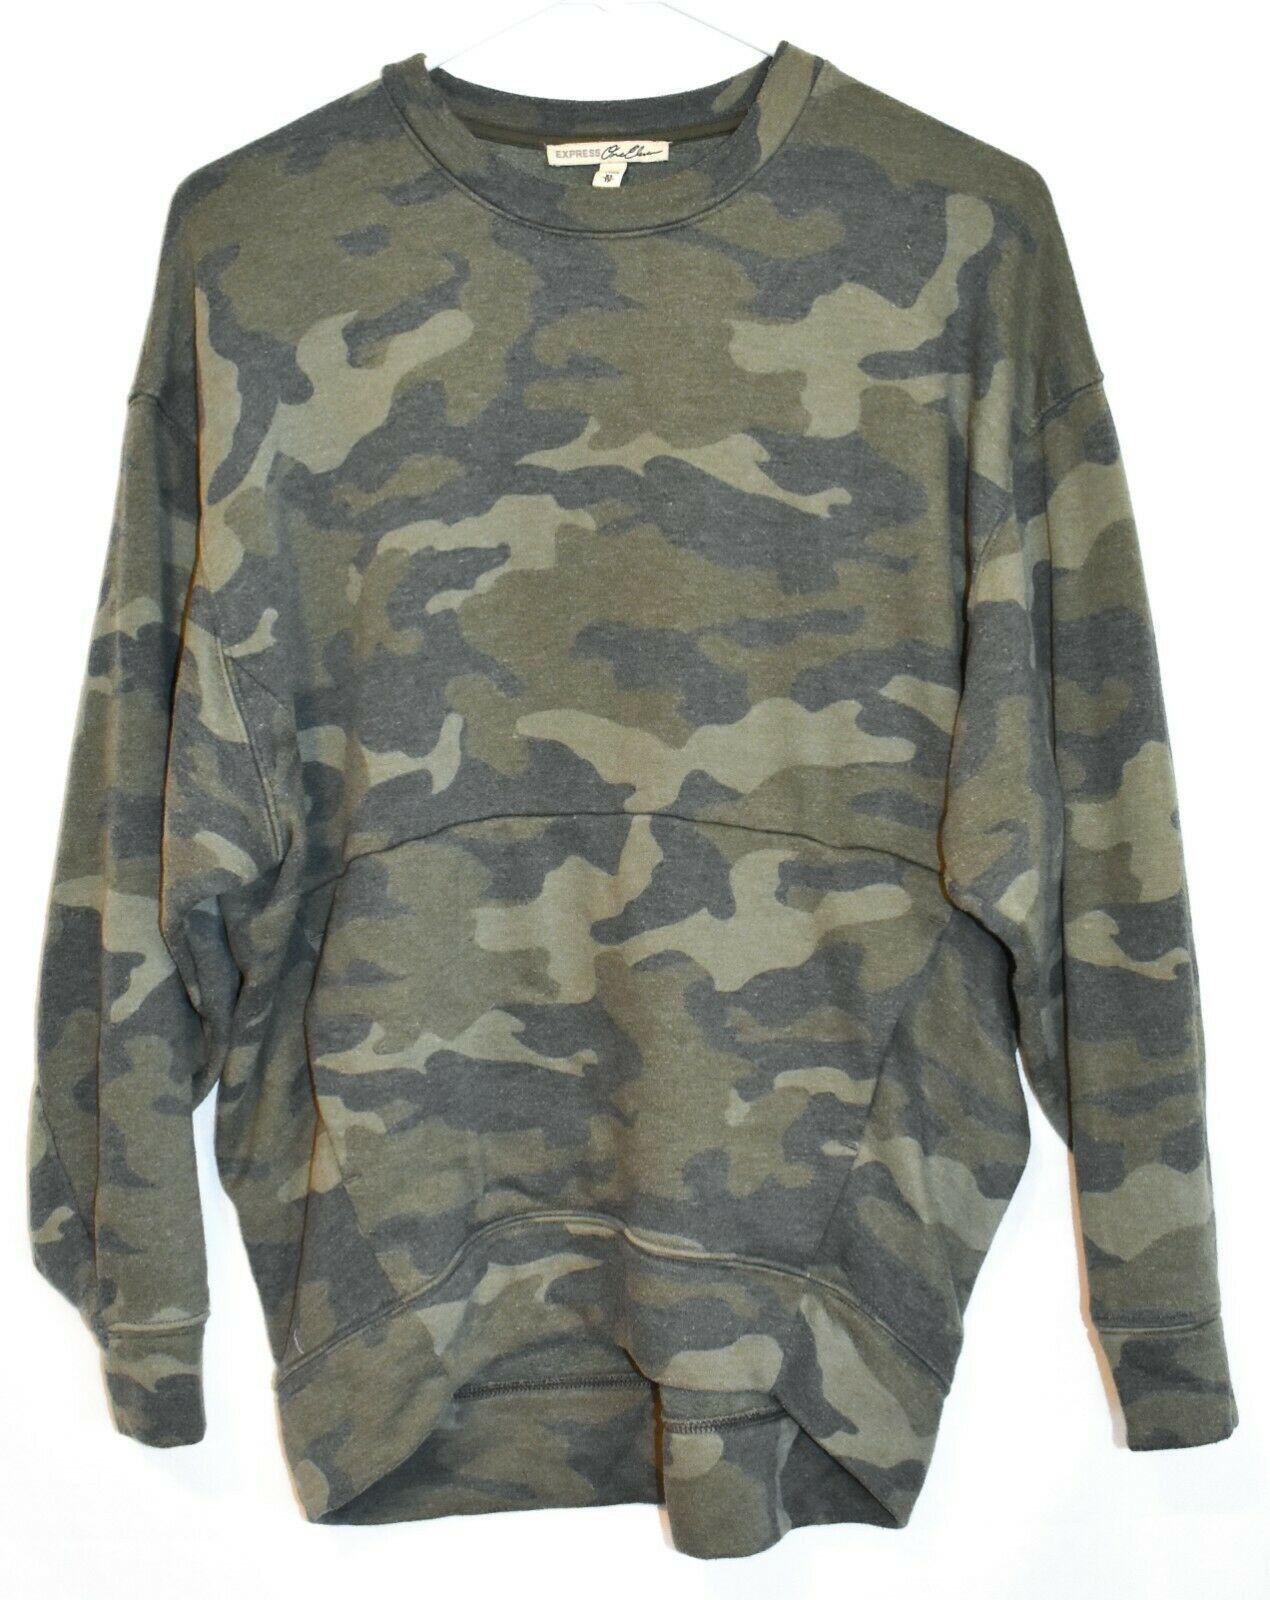 Express One Eleven Women's Faded Camo Crew Neck Front Pocket Sweatshirt Size XS